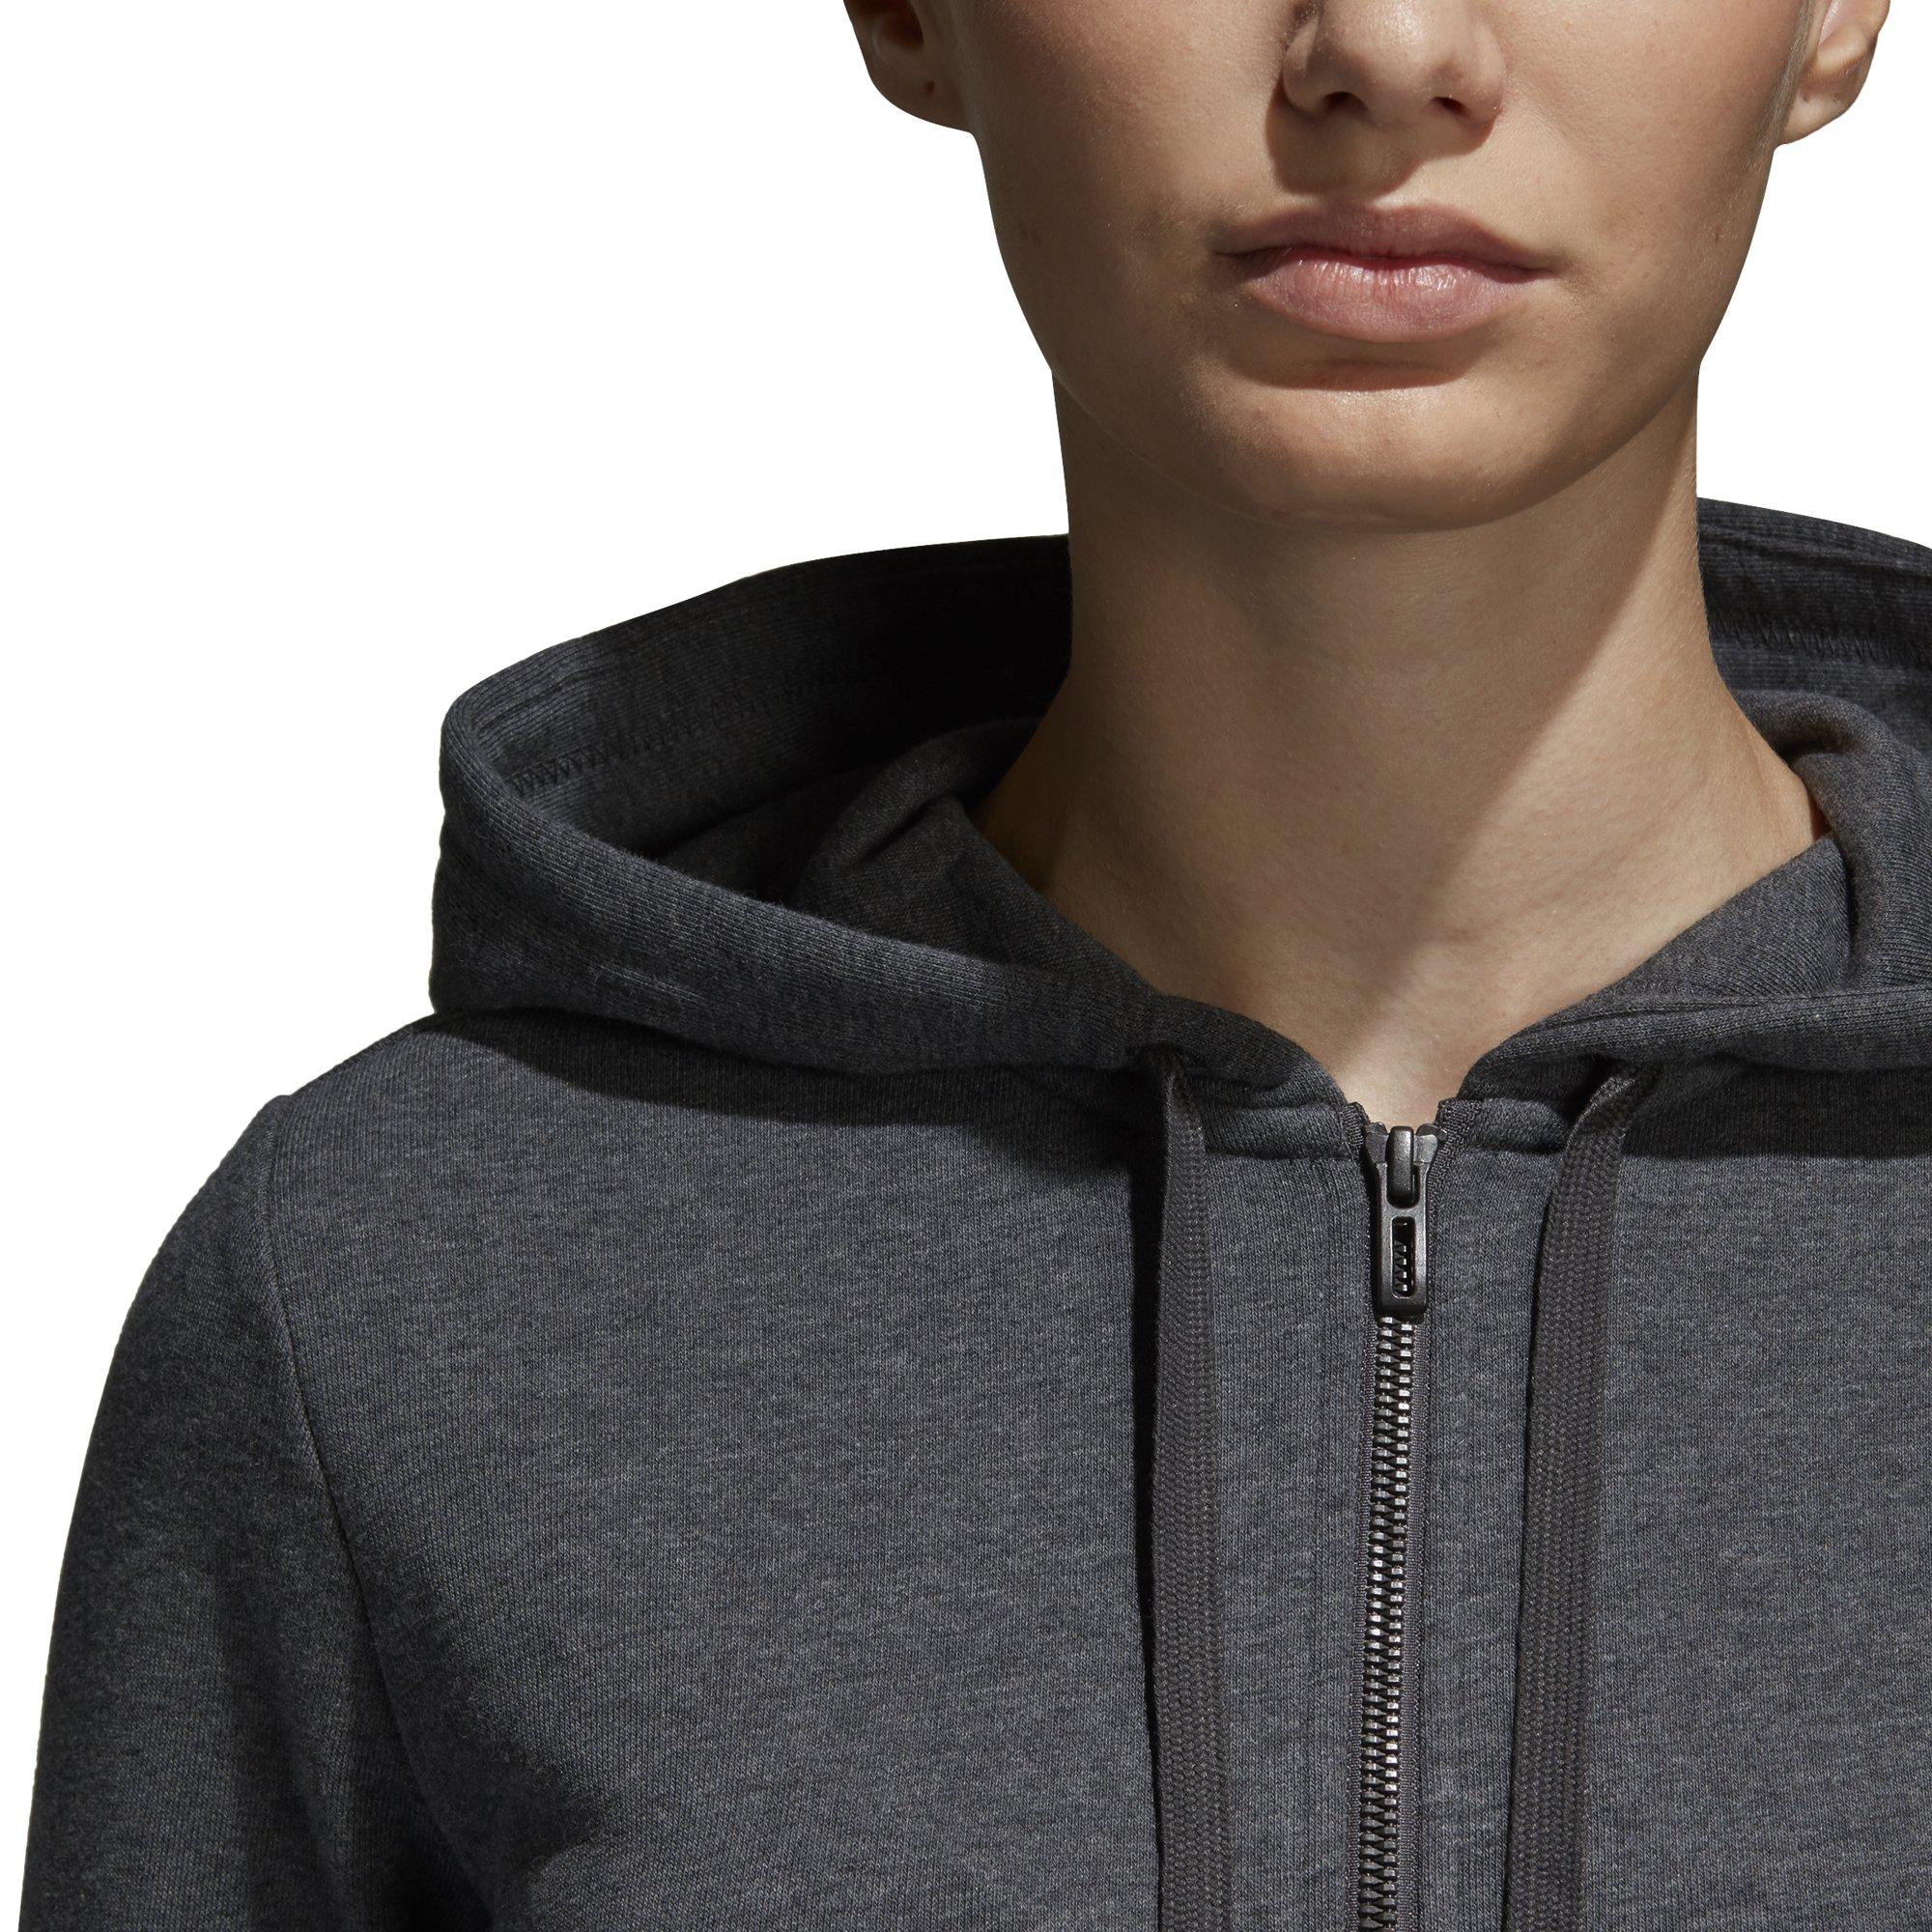 adidas Women's Essentials Linear Full Zip Fleece Hoodie, Dark Grey Heather/Real Coral, X-Small by adidas (Image #6)